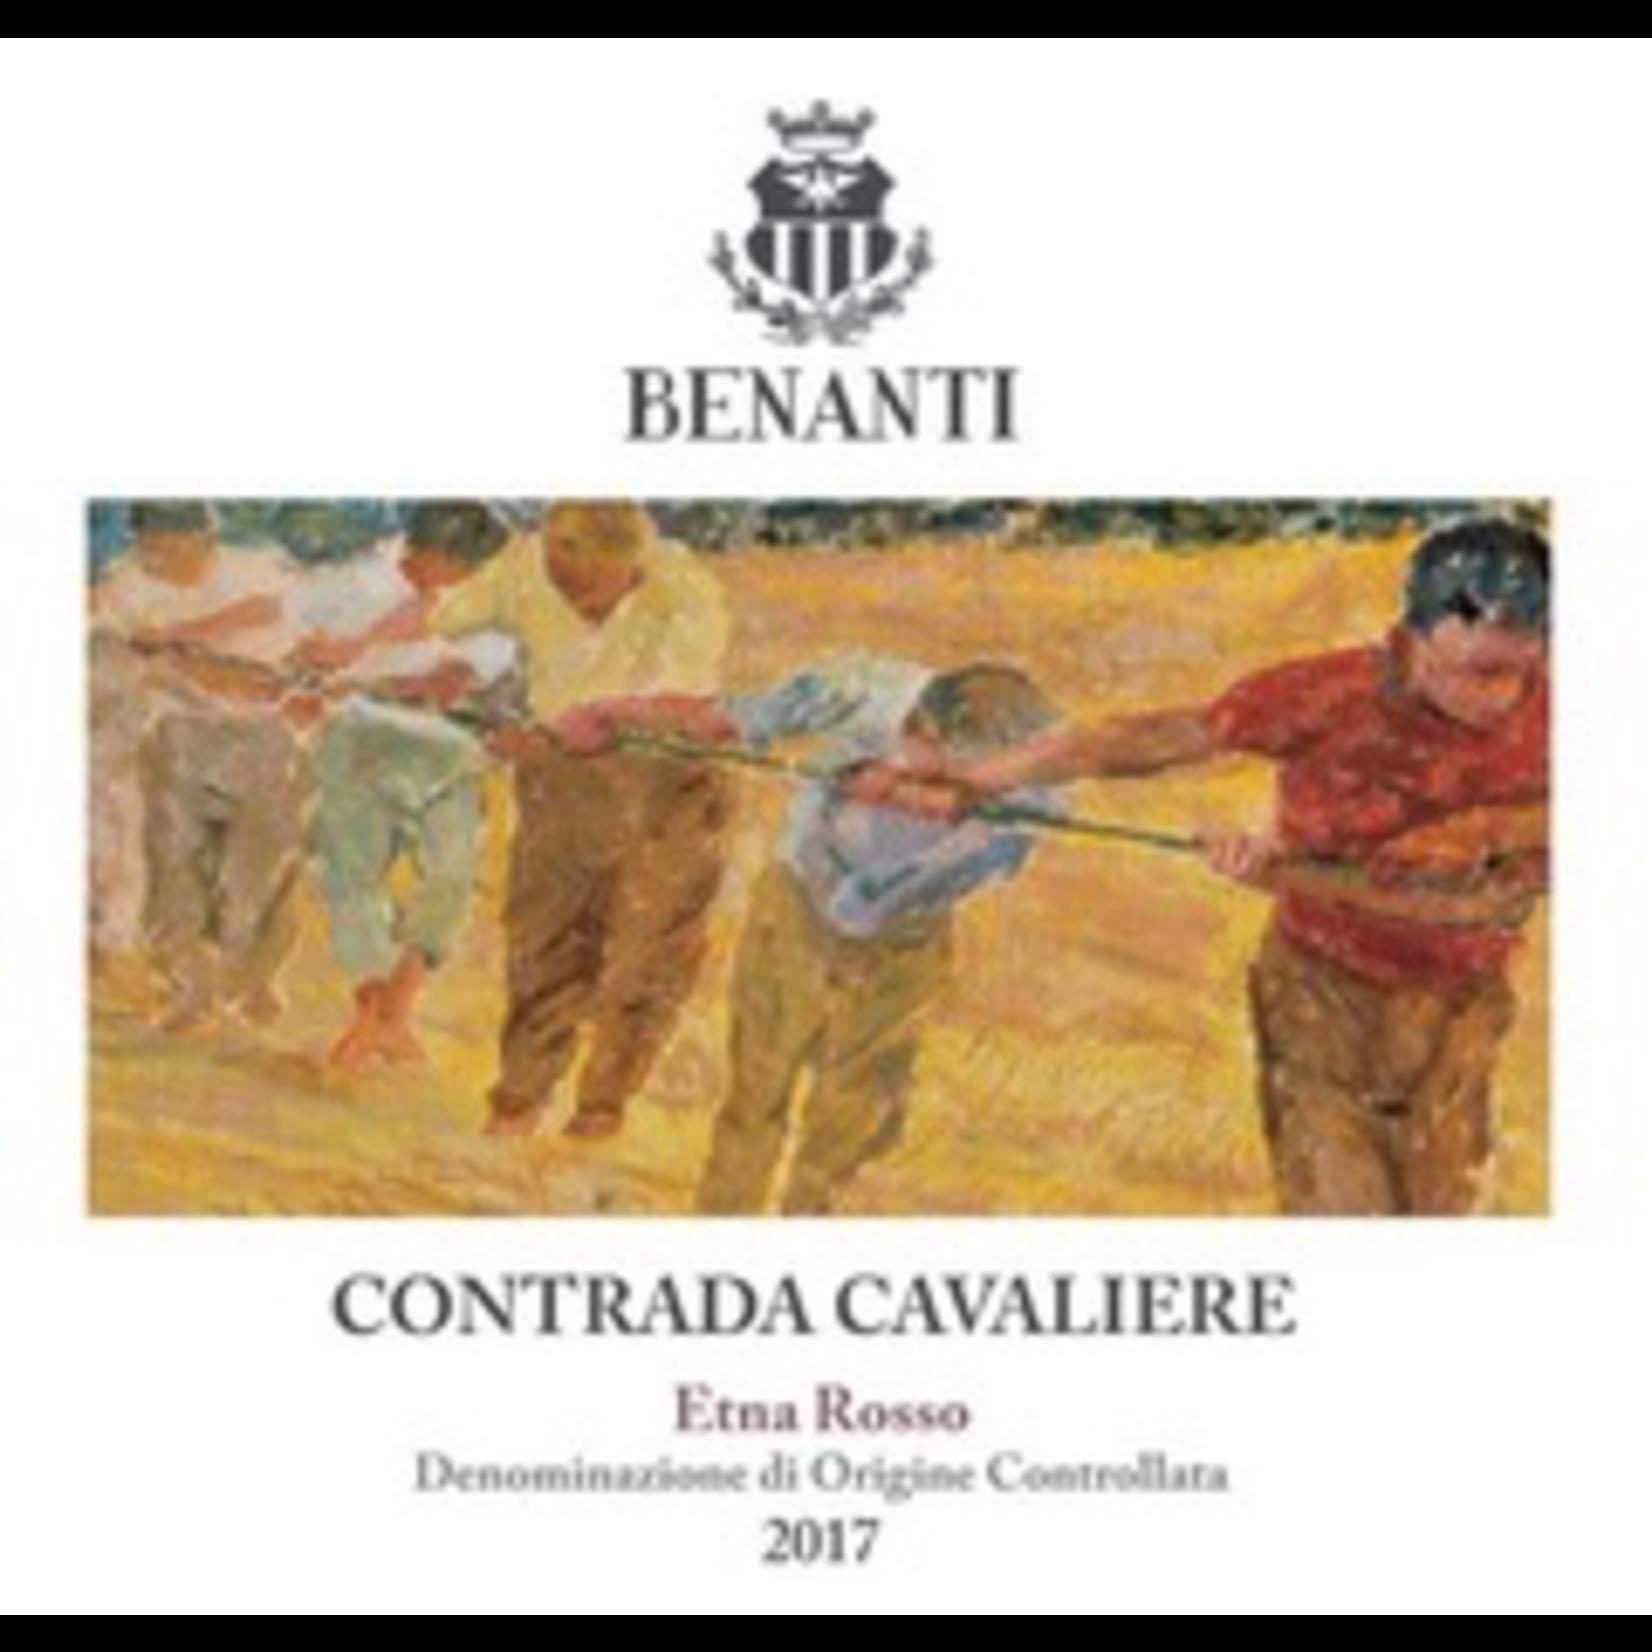 Benanti Contrada Cavaliere Etna Rosso 2017